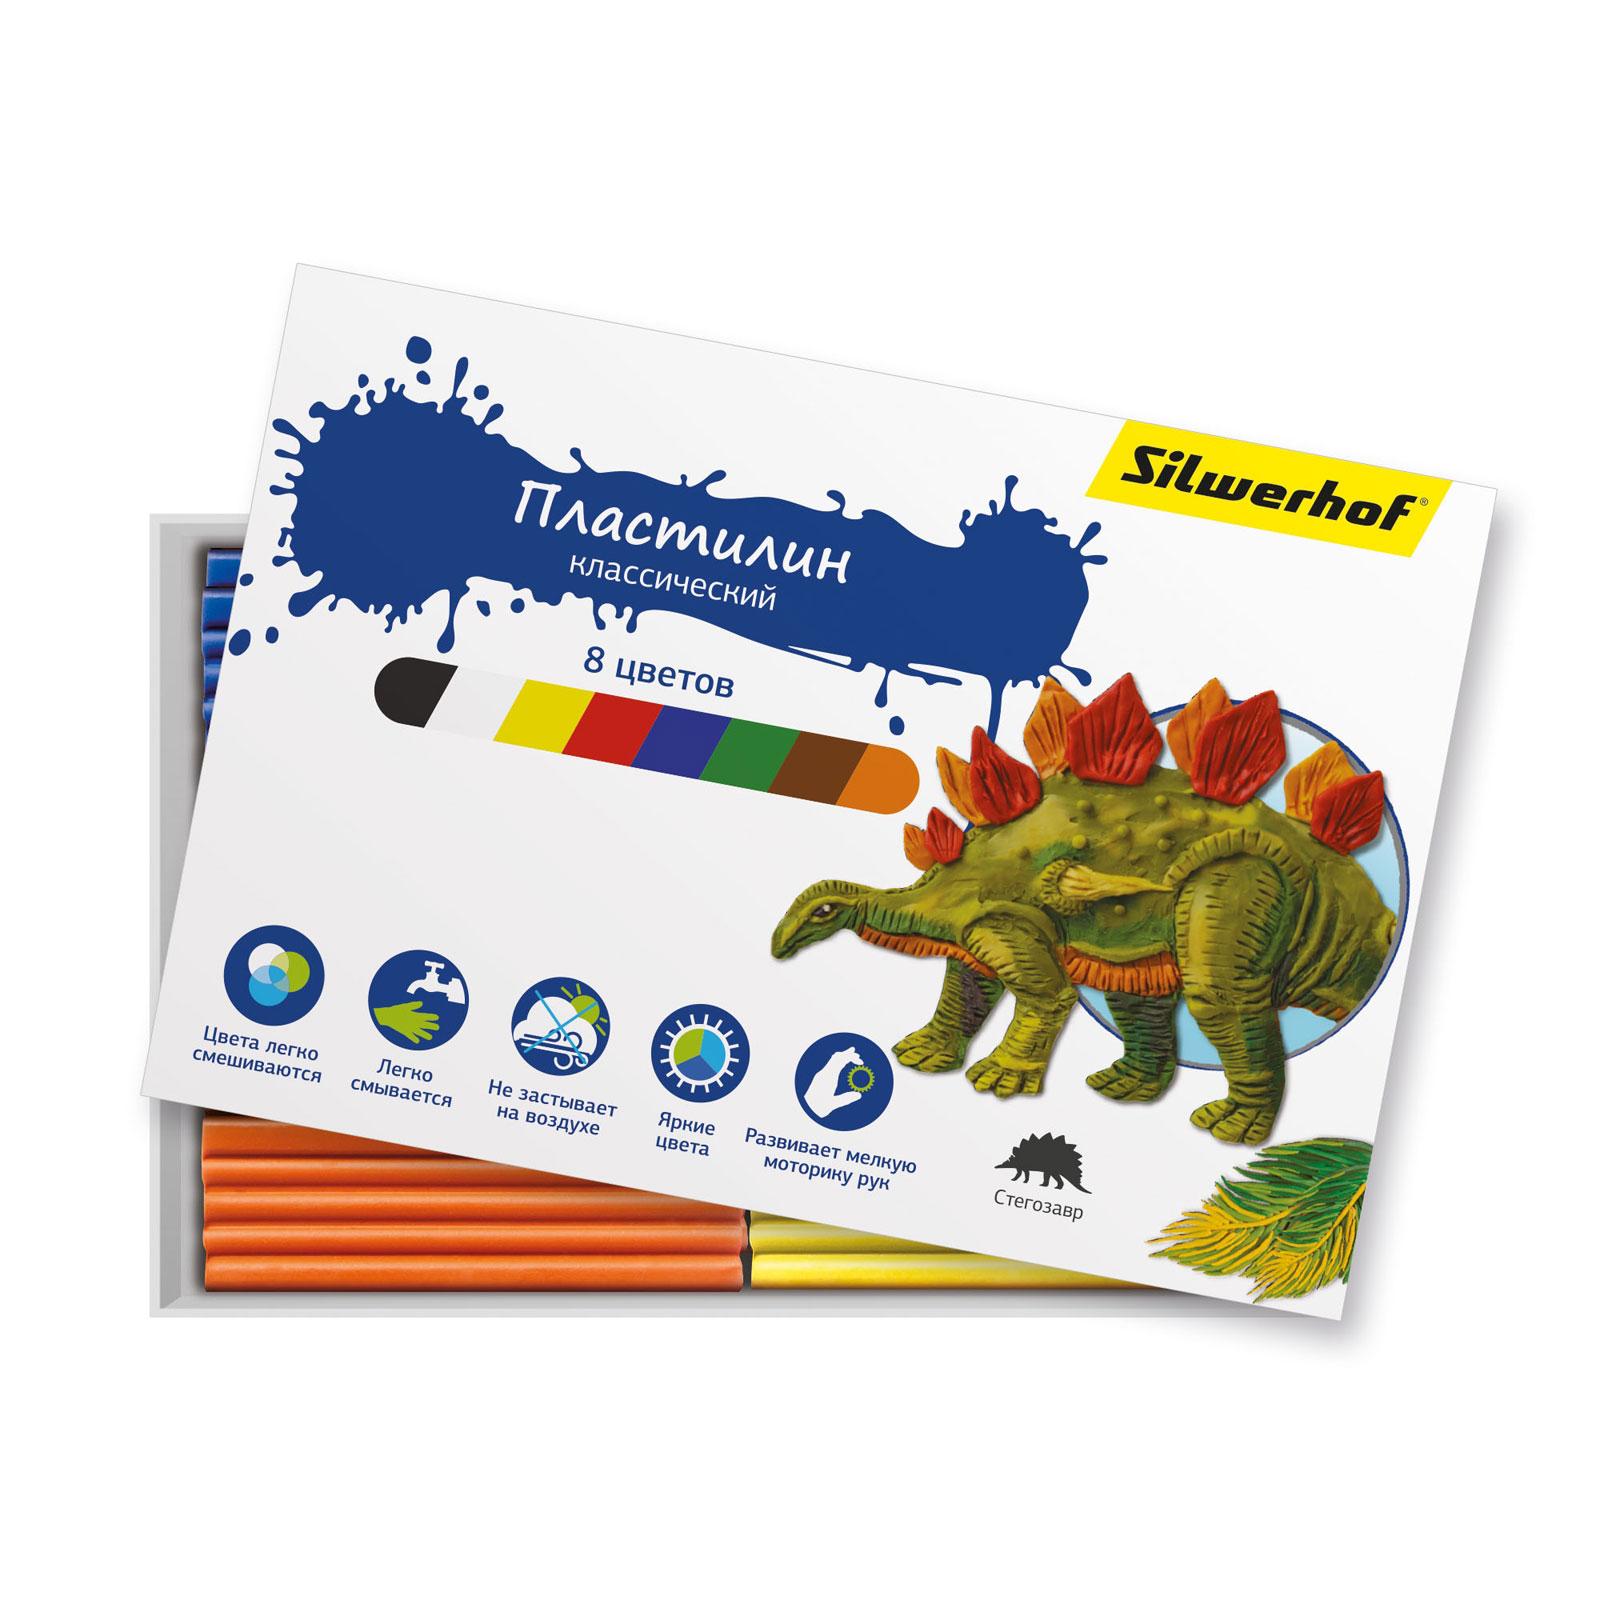 Пластилин Silwerhof 8 цветов 120 гр Динозавры